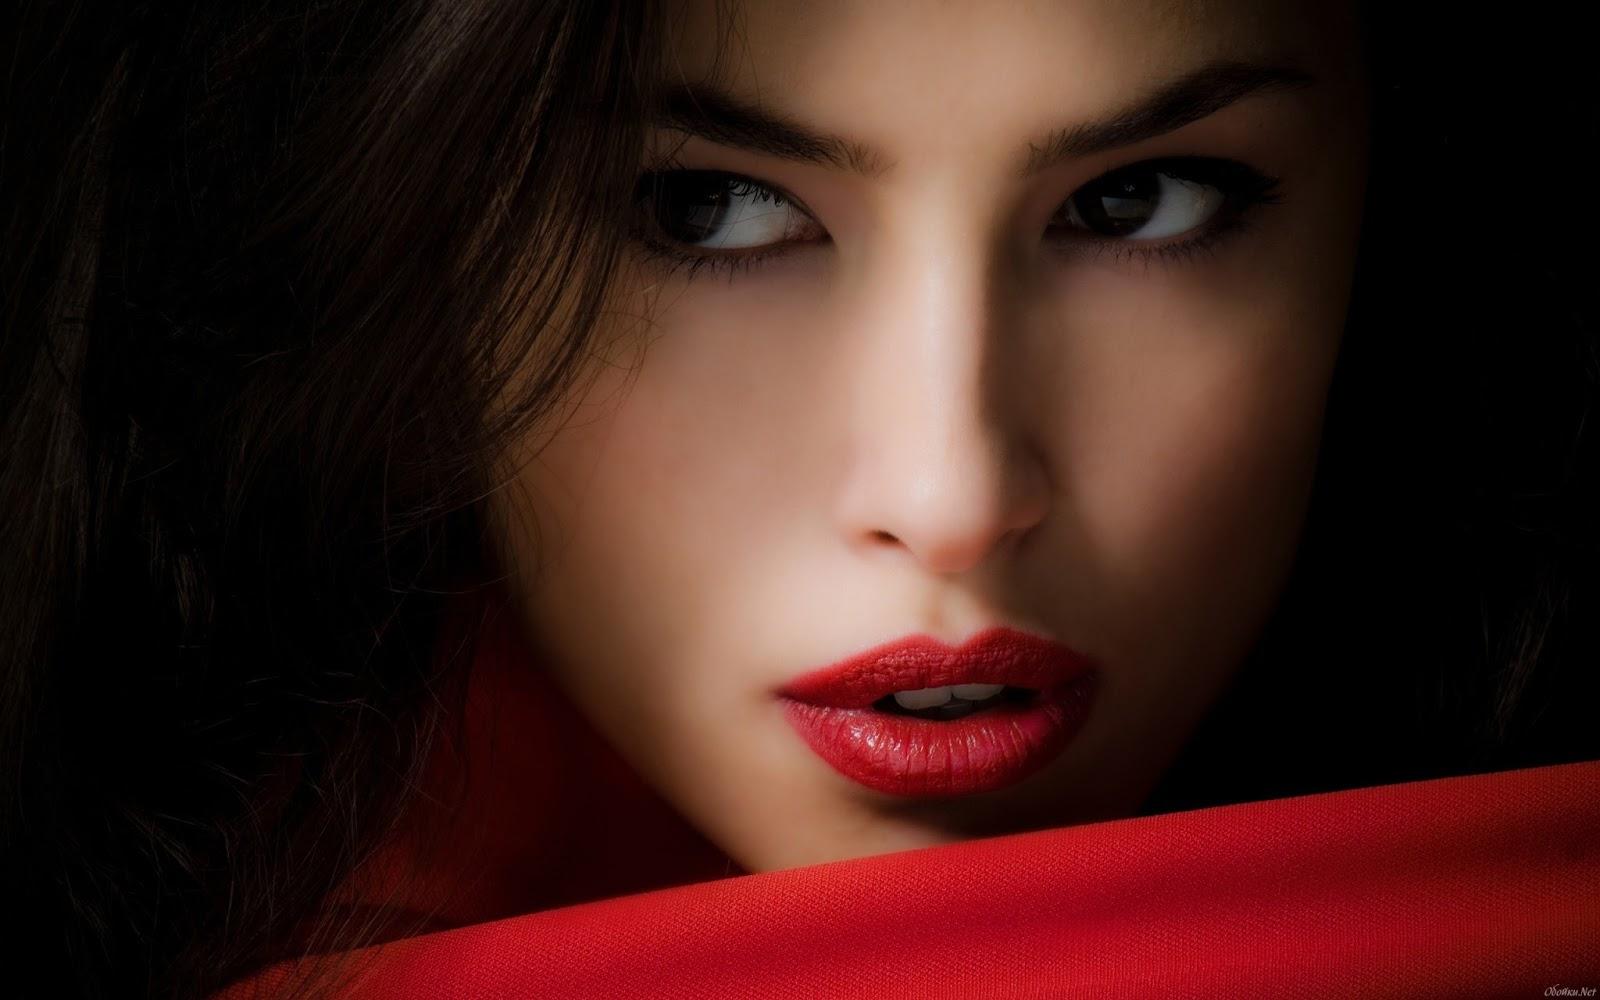 donna q in cerca di uomini a bogotà cam erotiche gratis